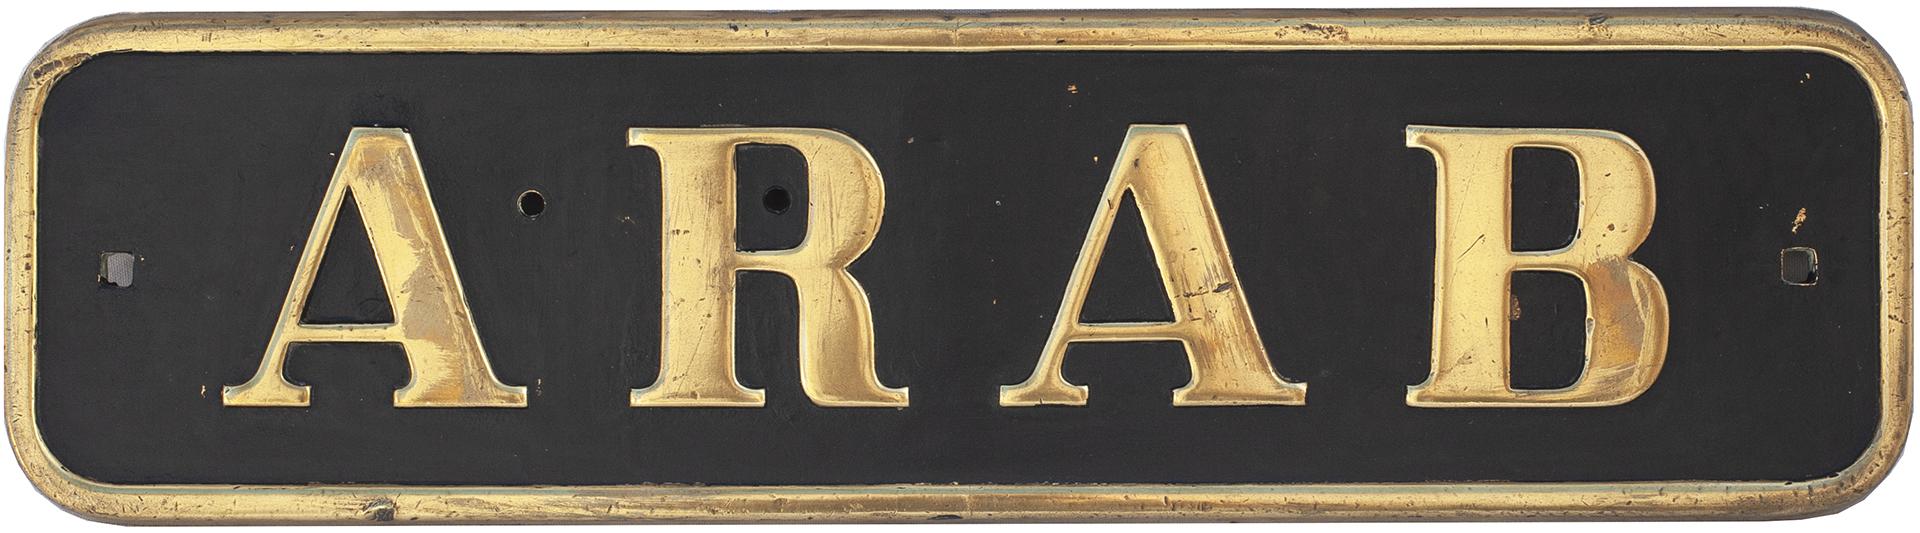 Nameplate ARAB Ex Peckett m4 0-4-0 ST Built In